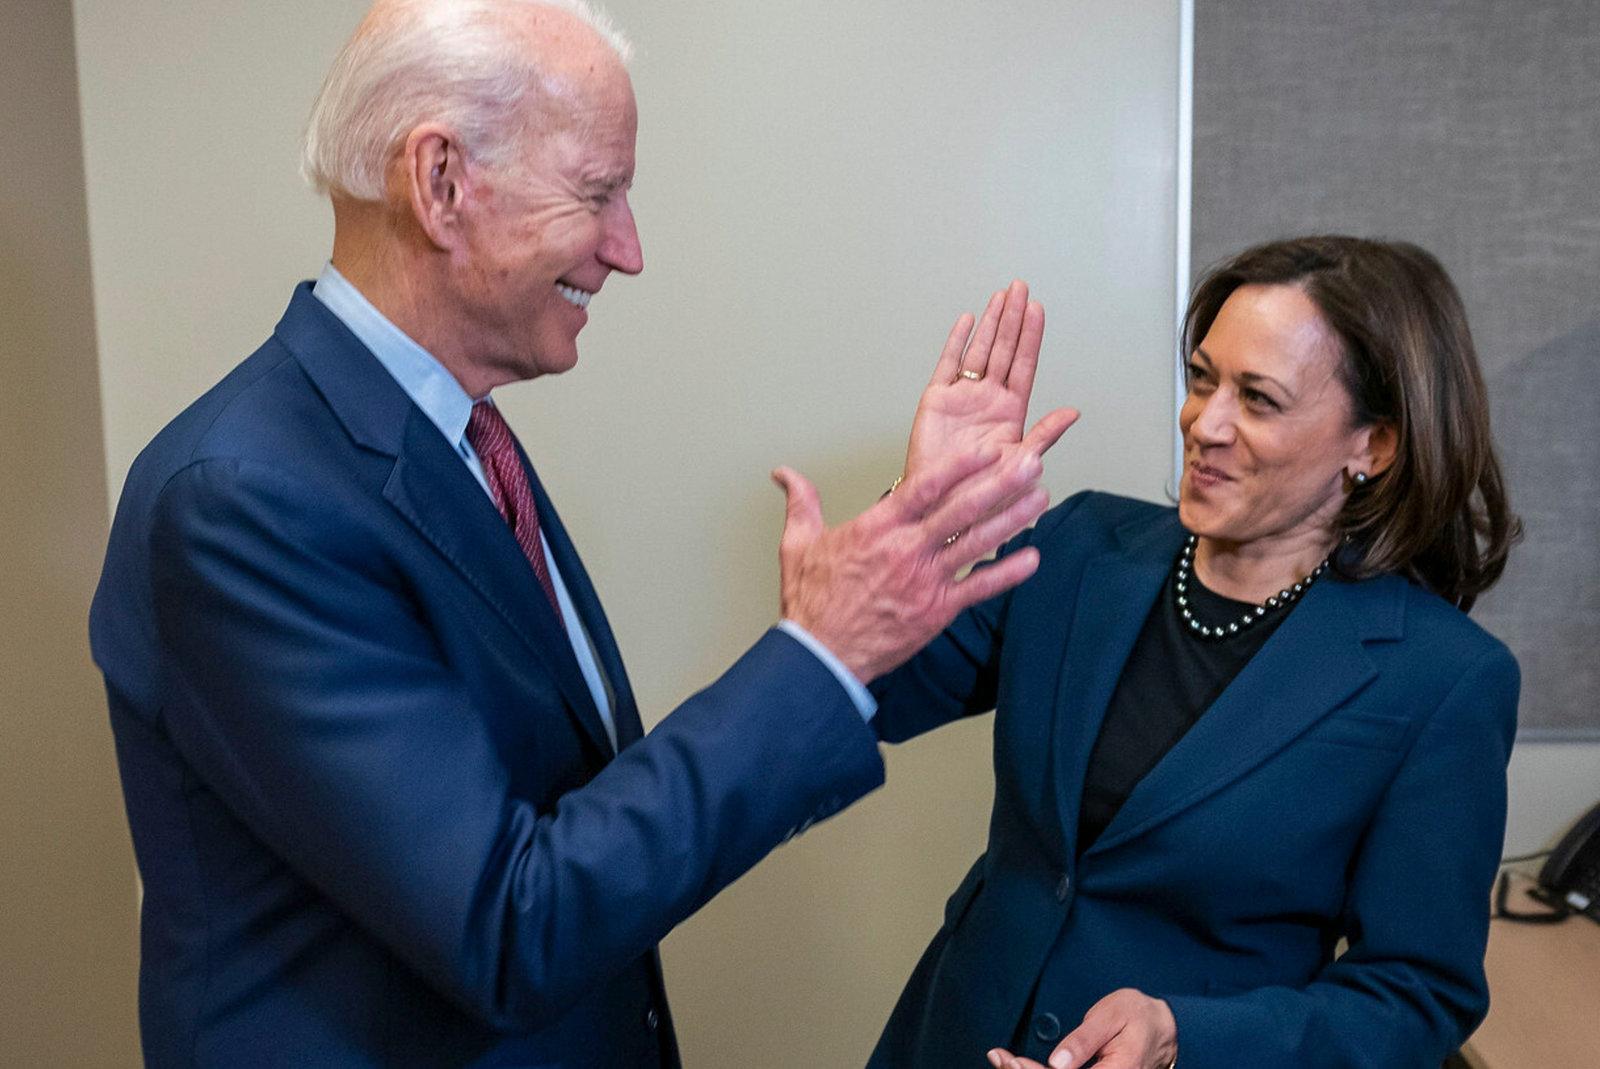 '¡Lo hemos conseguido, Joe!', así celebró Kamala Harris el triunfo de Biden